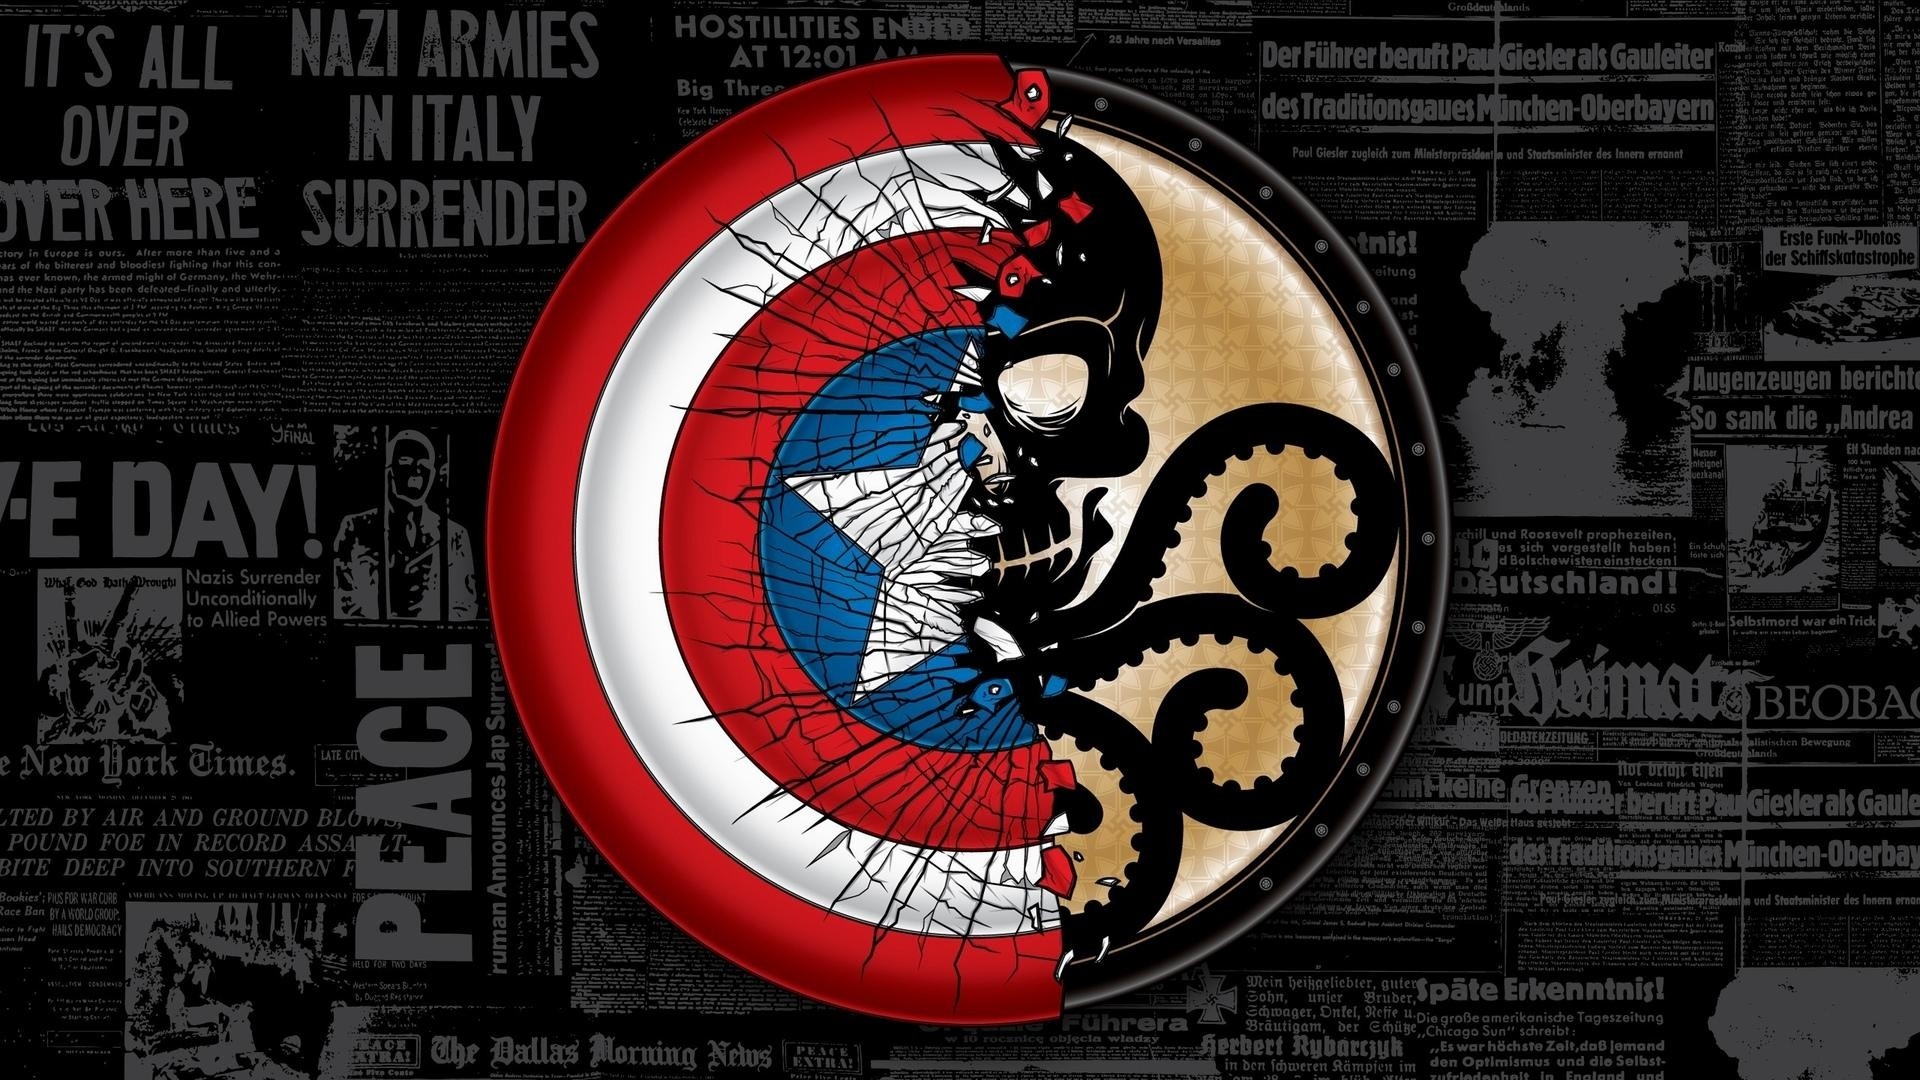 wallpaper.wiki-Photos-Captain-America-Shield-HD-PIC-